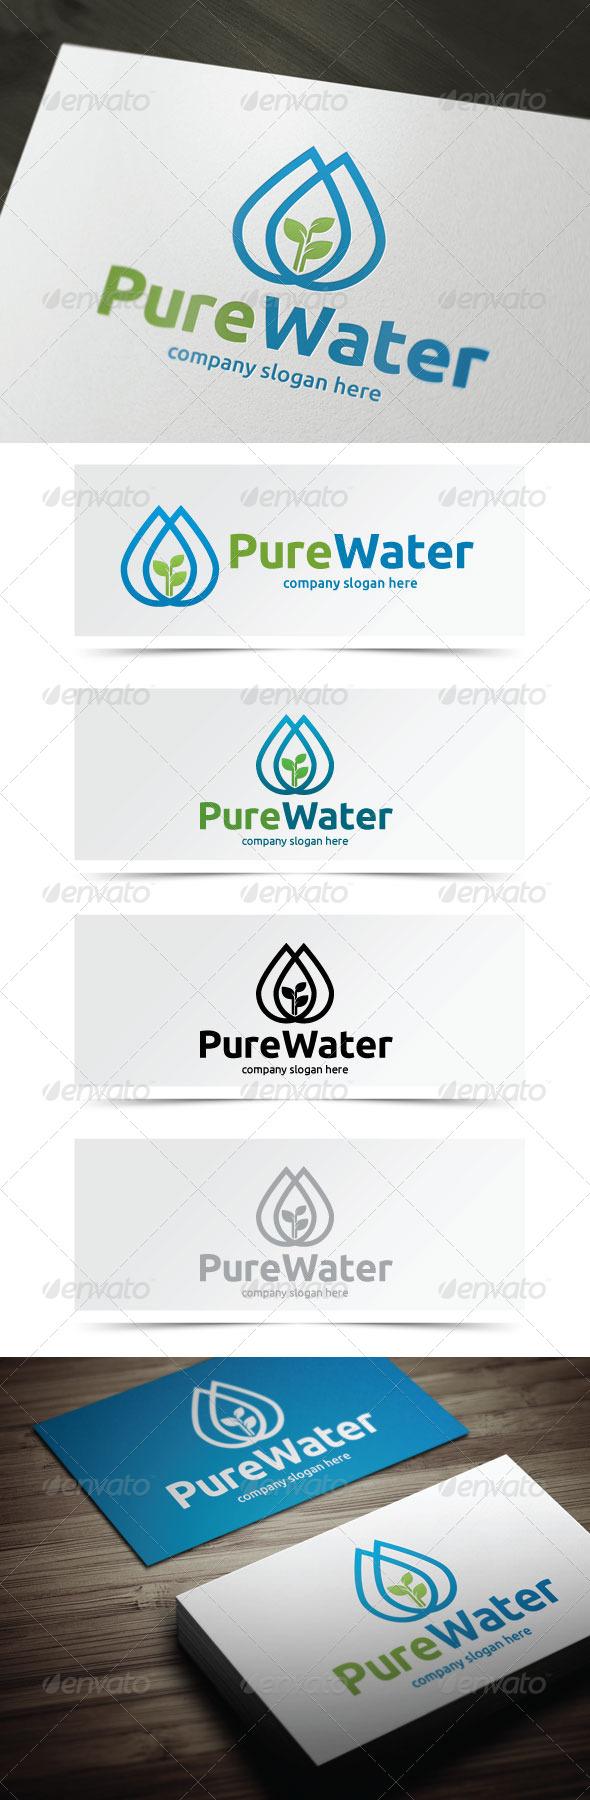 GraphicRiver Pure Water 5236971